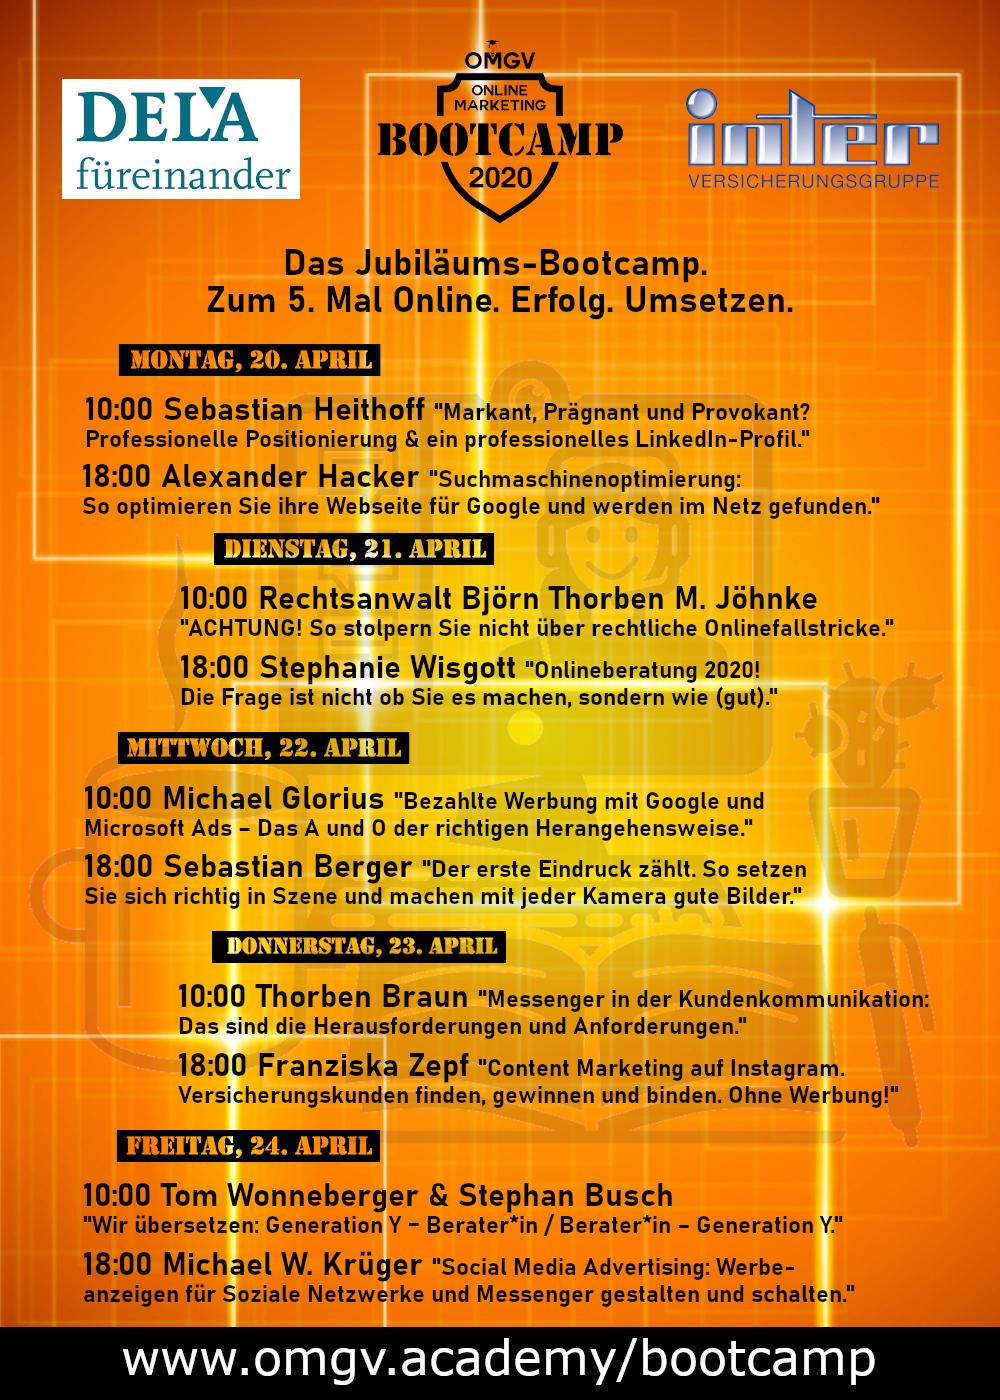 LineUp+OMGV+Bootcamp+2020+mit+Sponsoren.png